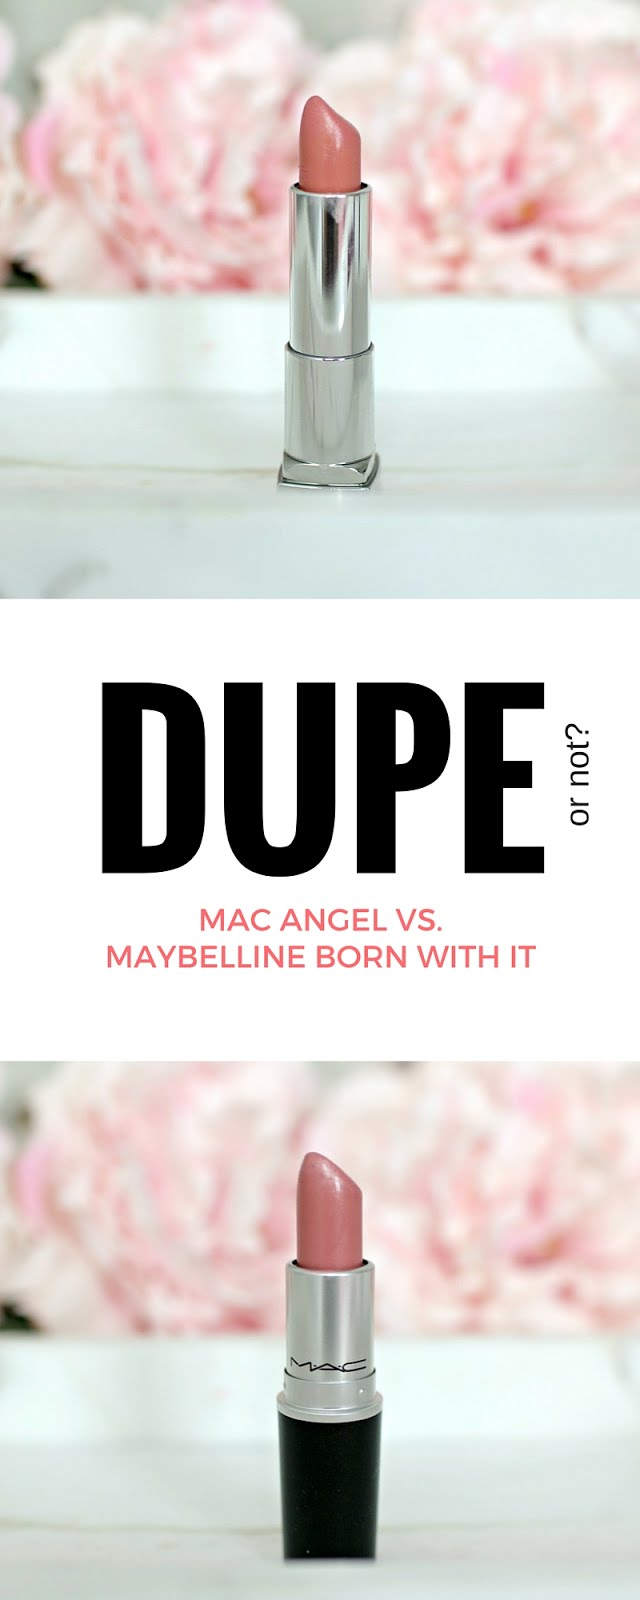 Mac Angel Dupe Wet N Wild 901b Lipstick Dupe: Beauty Blogger In Atlanta: Dupe? MAC Angel Vs